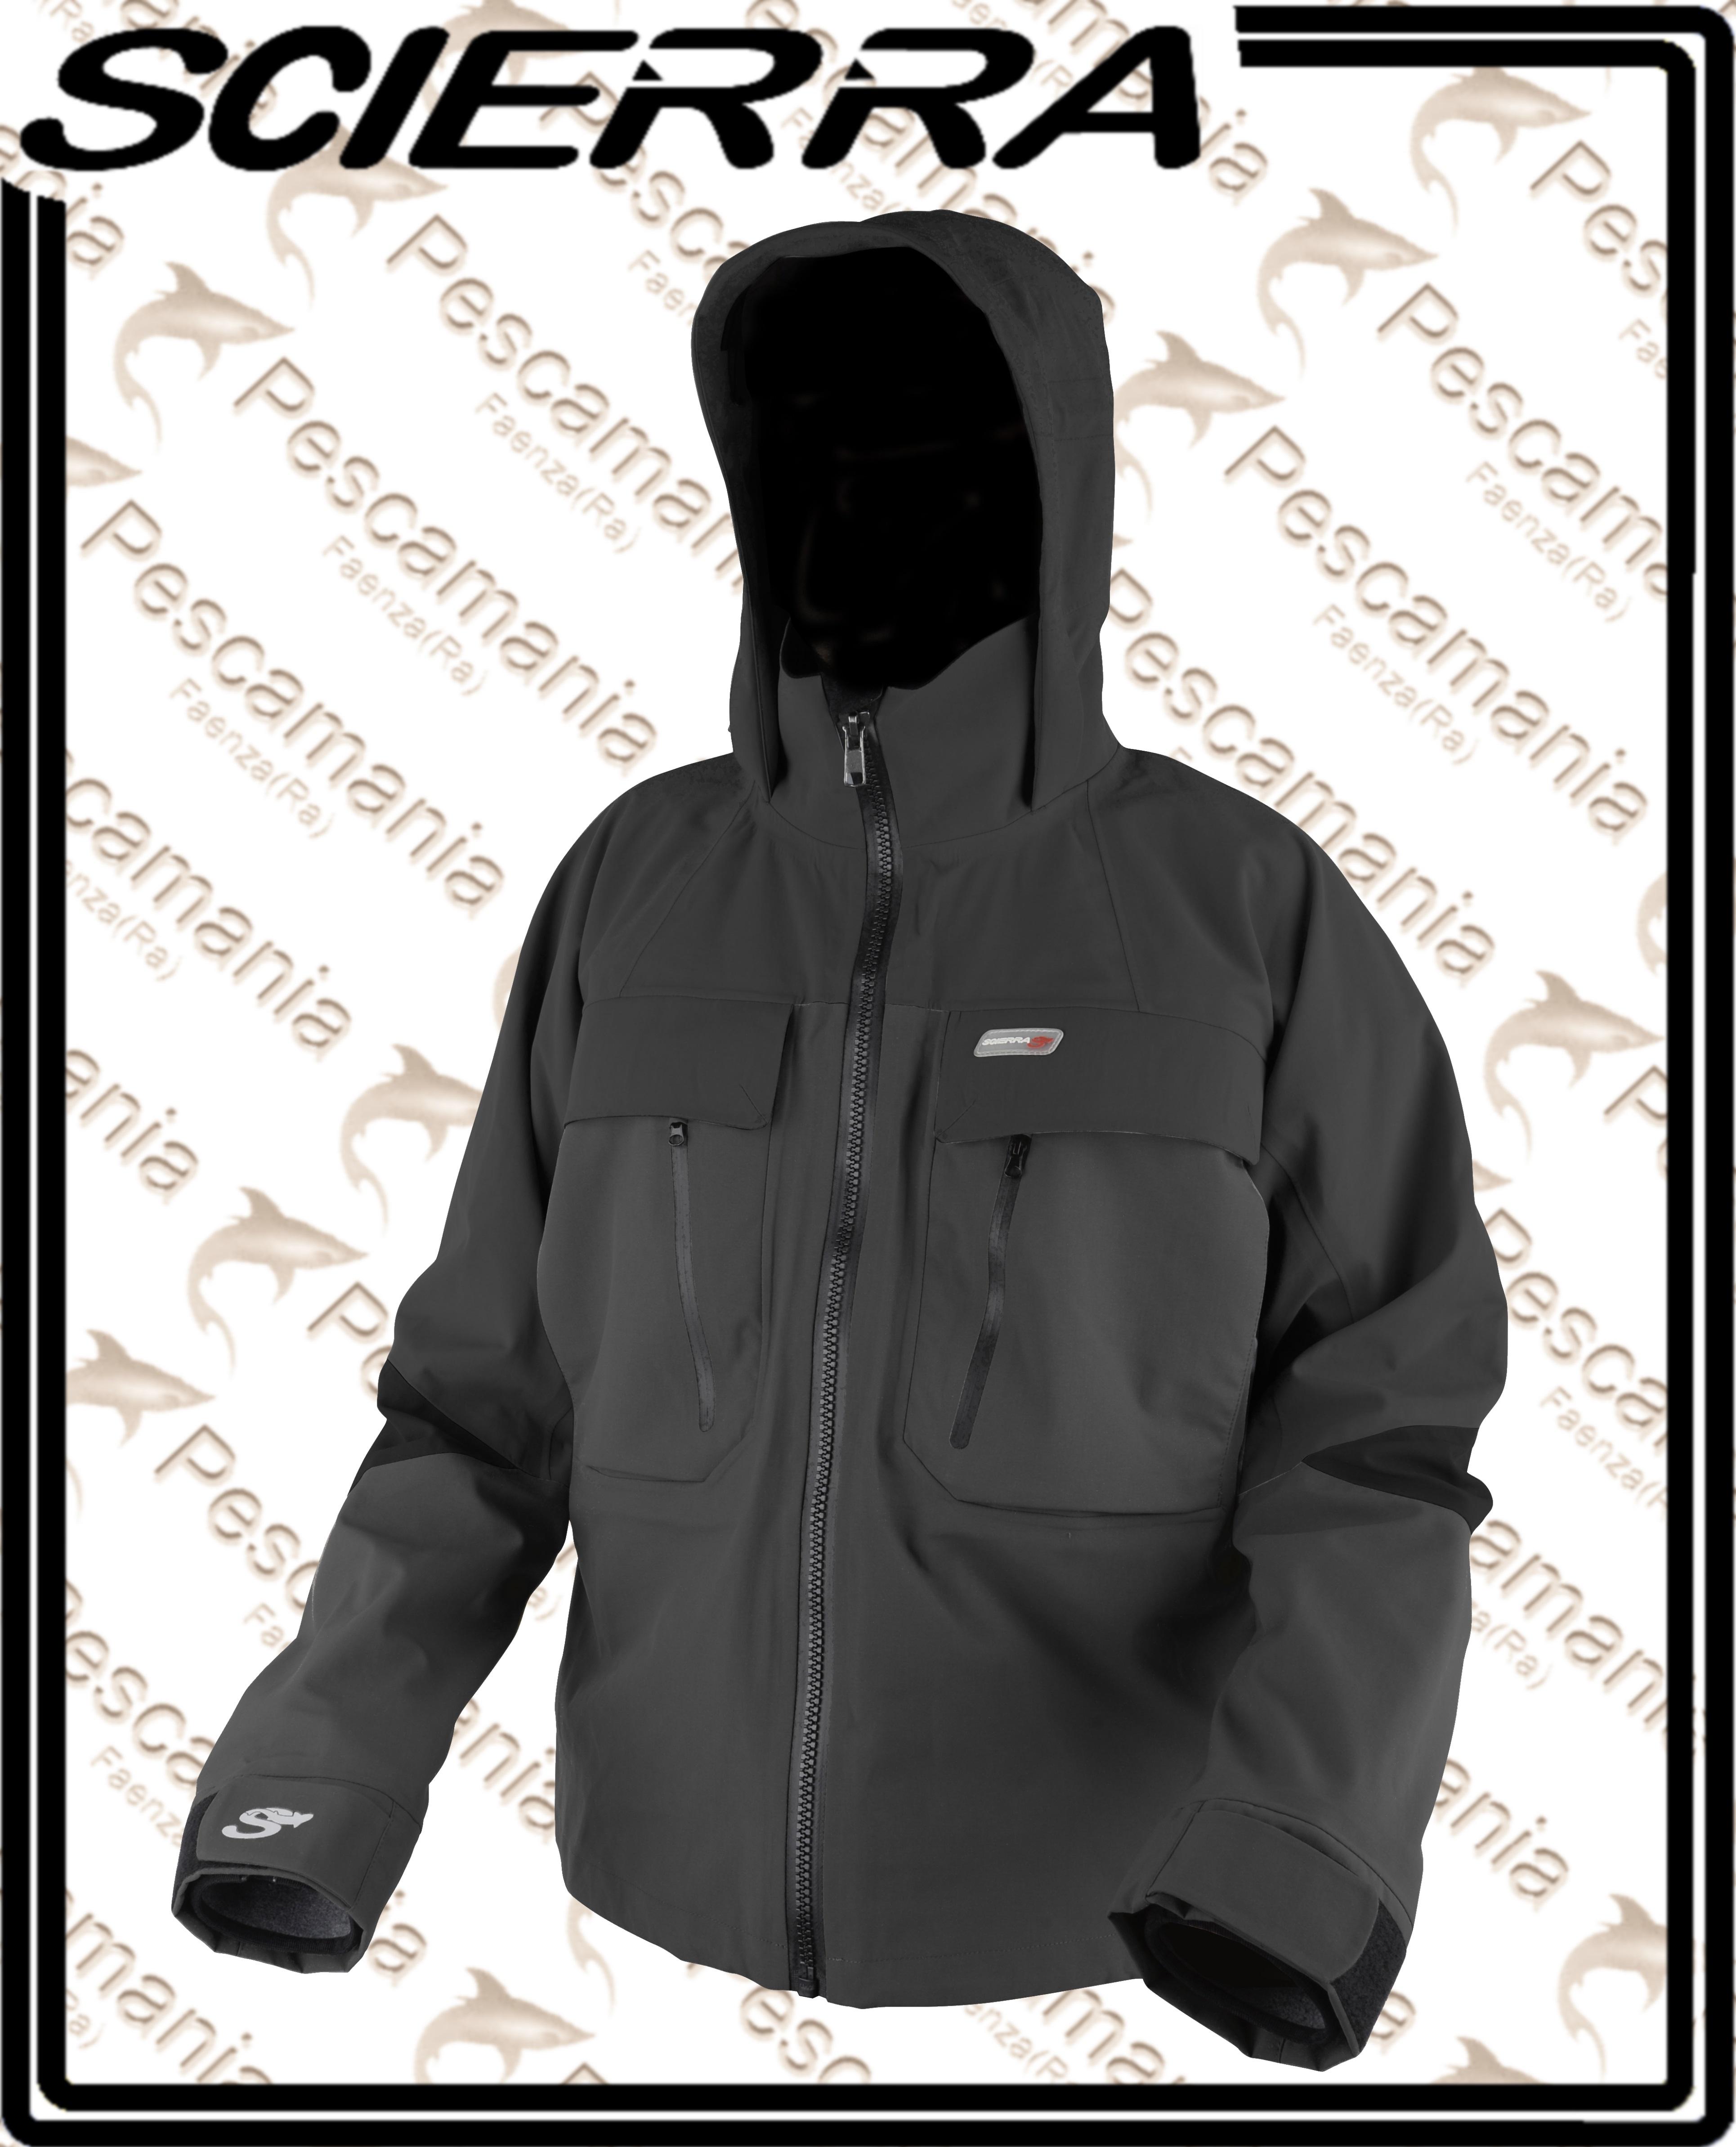 dd7fcba3c4c8a4 Scierra C&R wading jacket giacca tecnica traspirante impermeabile ...